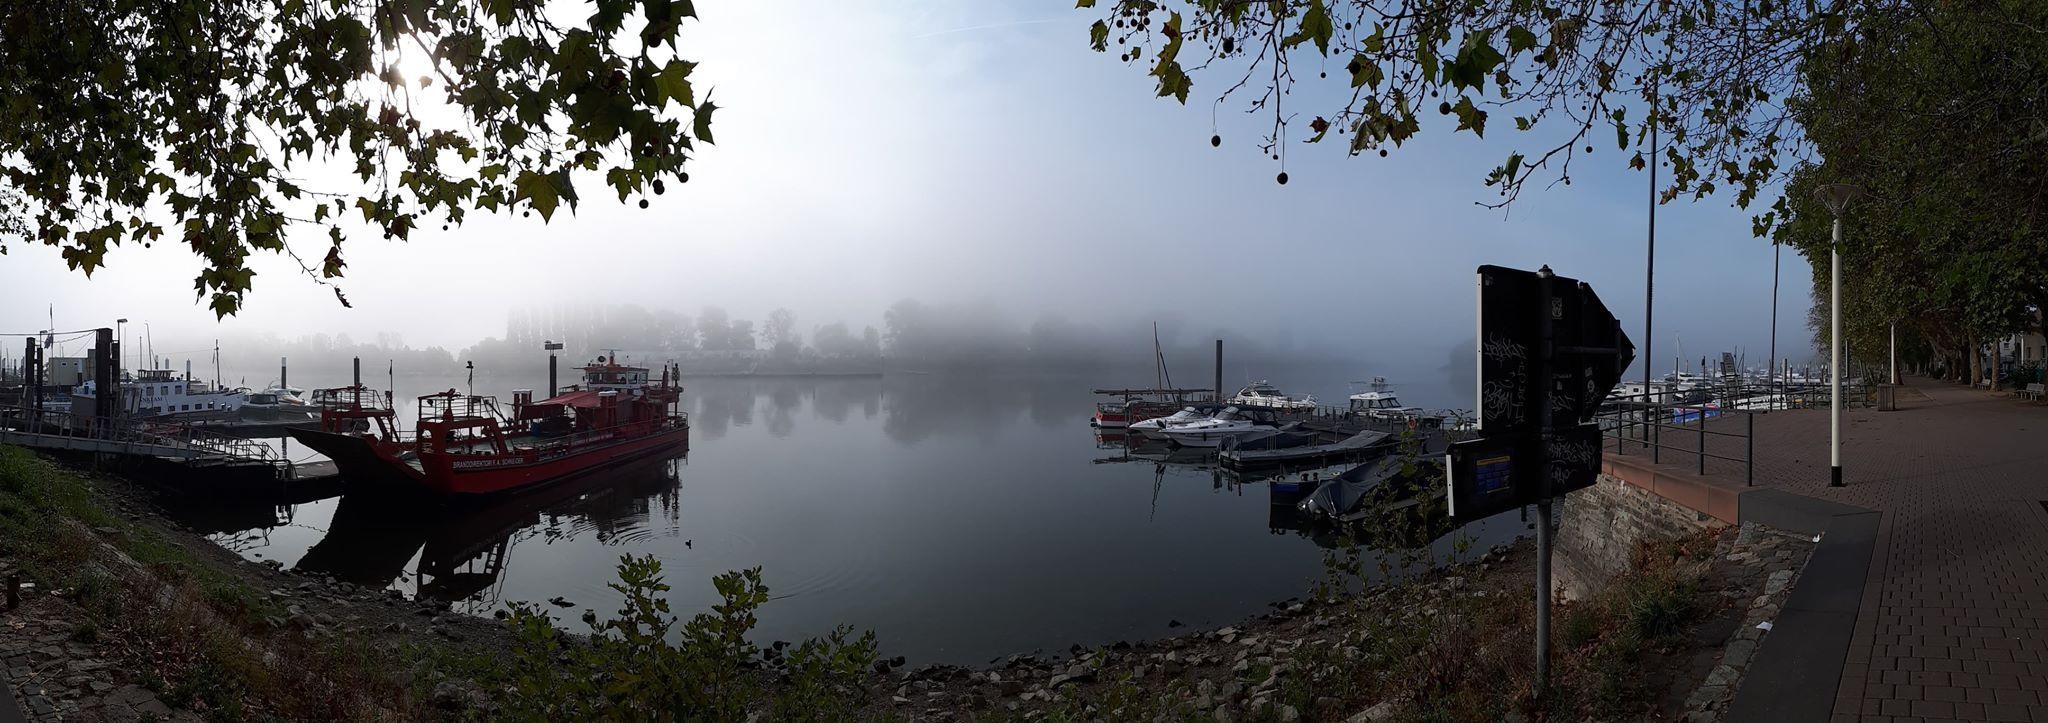 Nebel Rhein Wiesbaden